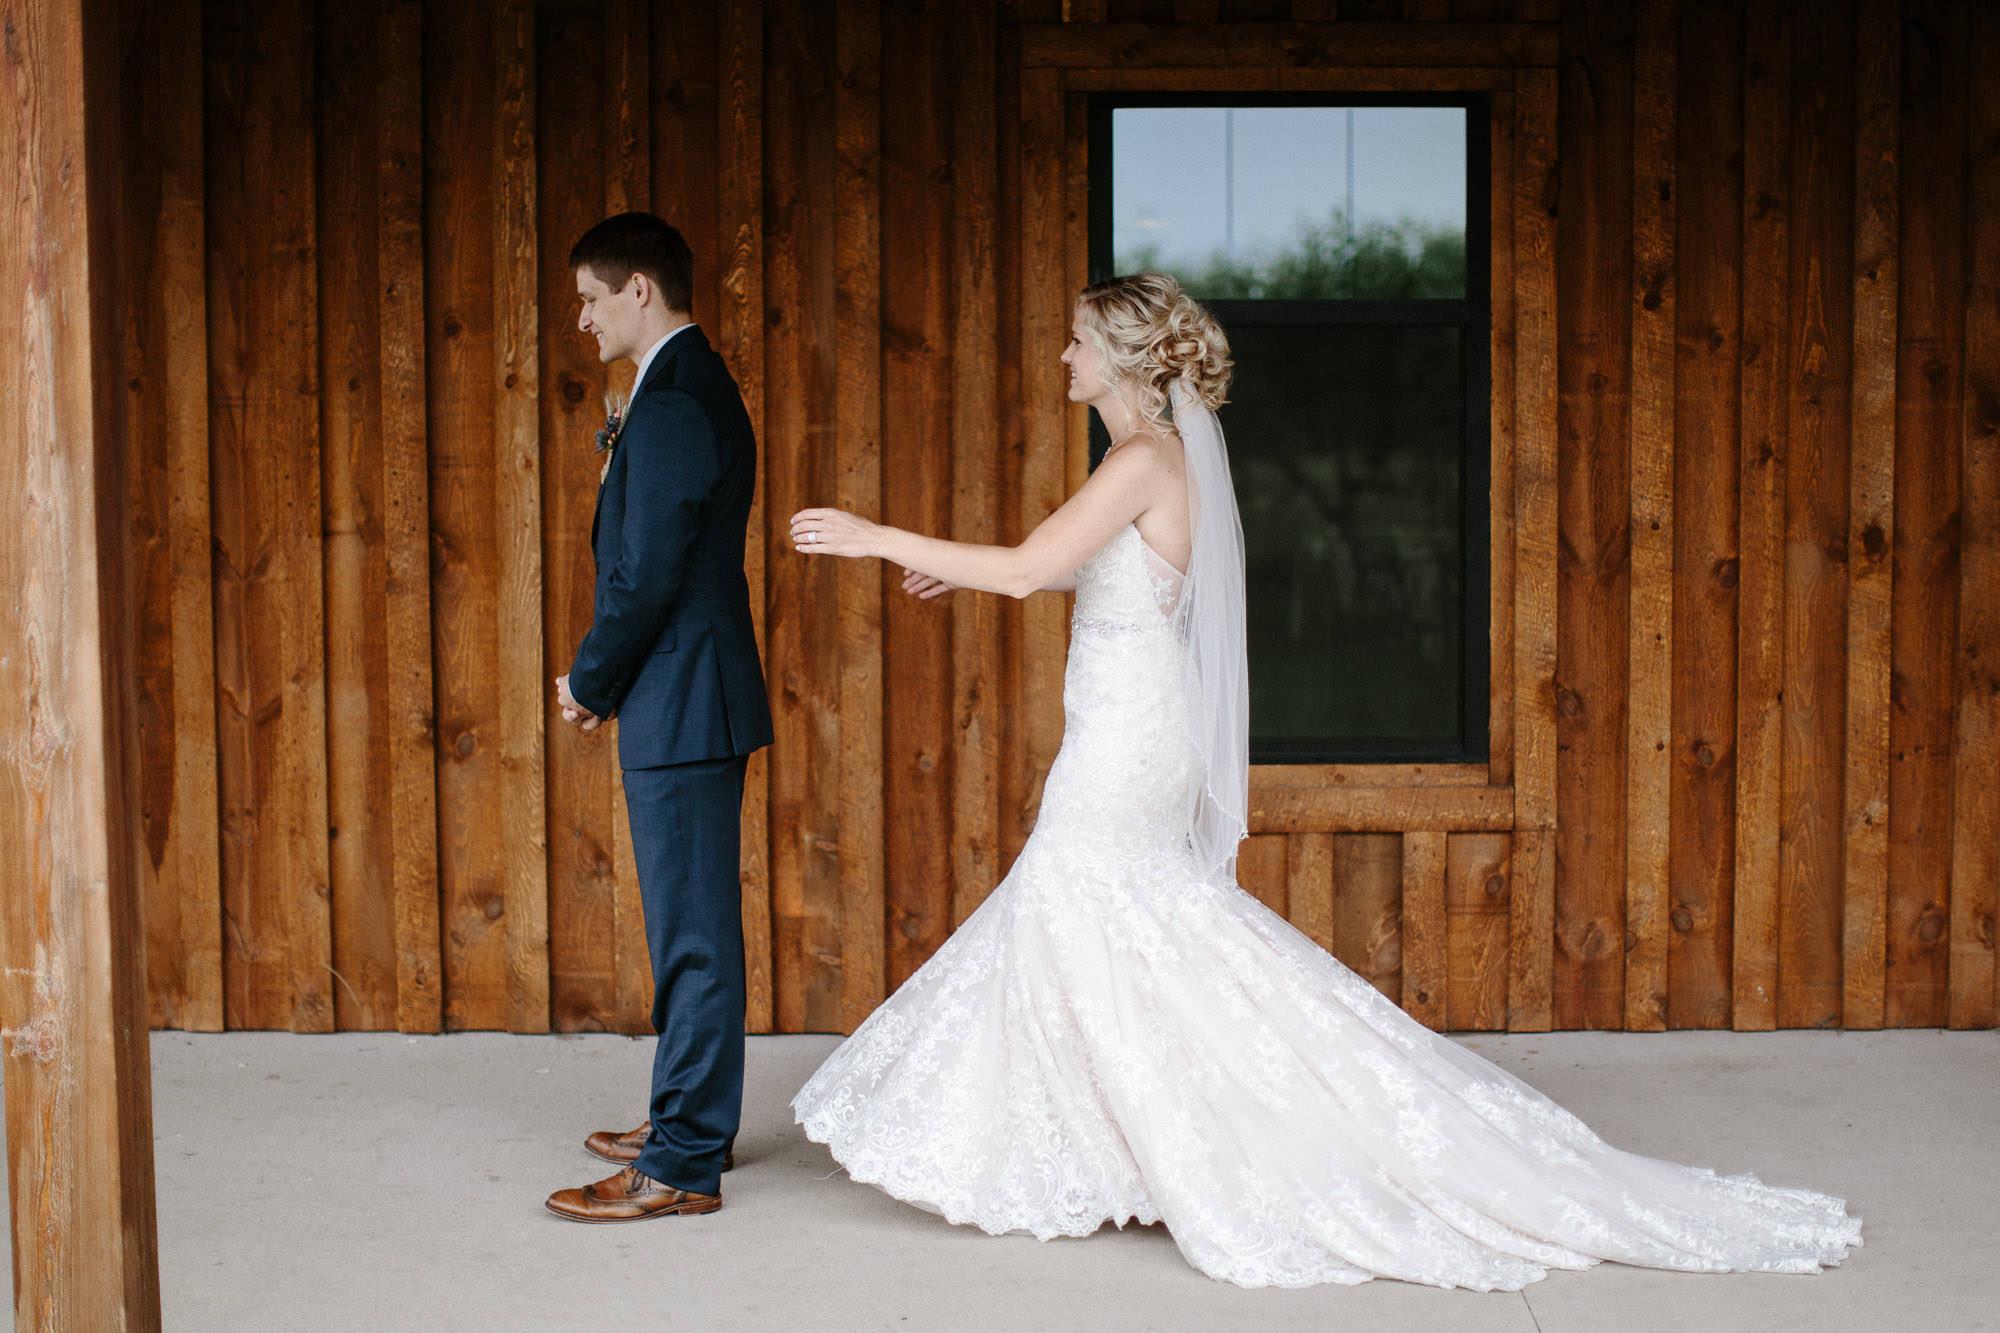 meadow-barn-wedding-sioux-falls-south-dakota-romantic-adventerous-michael-liedtke-photography018.jpg